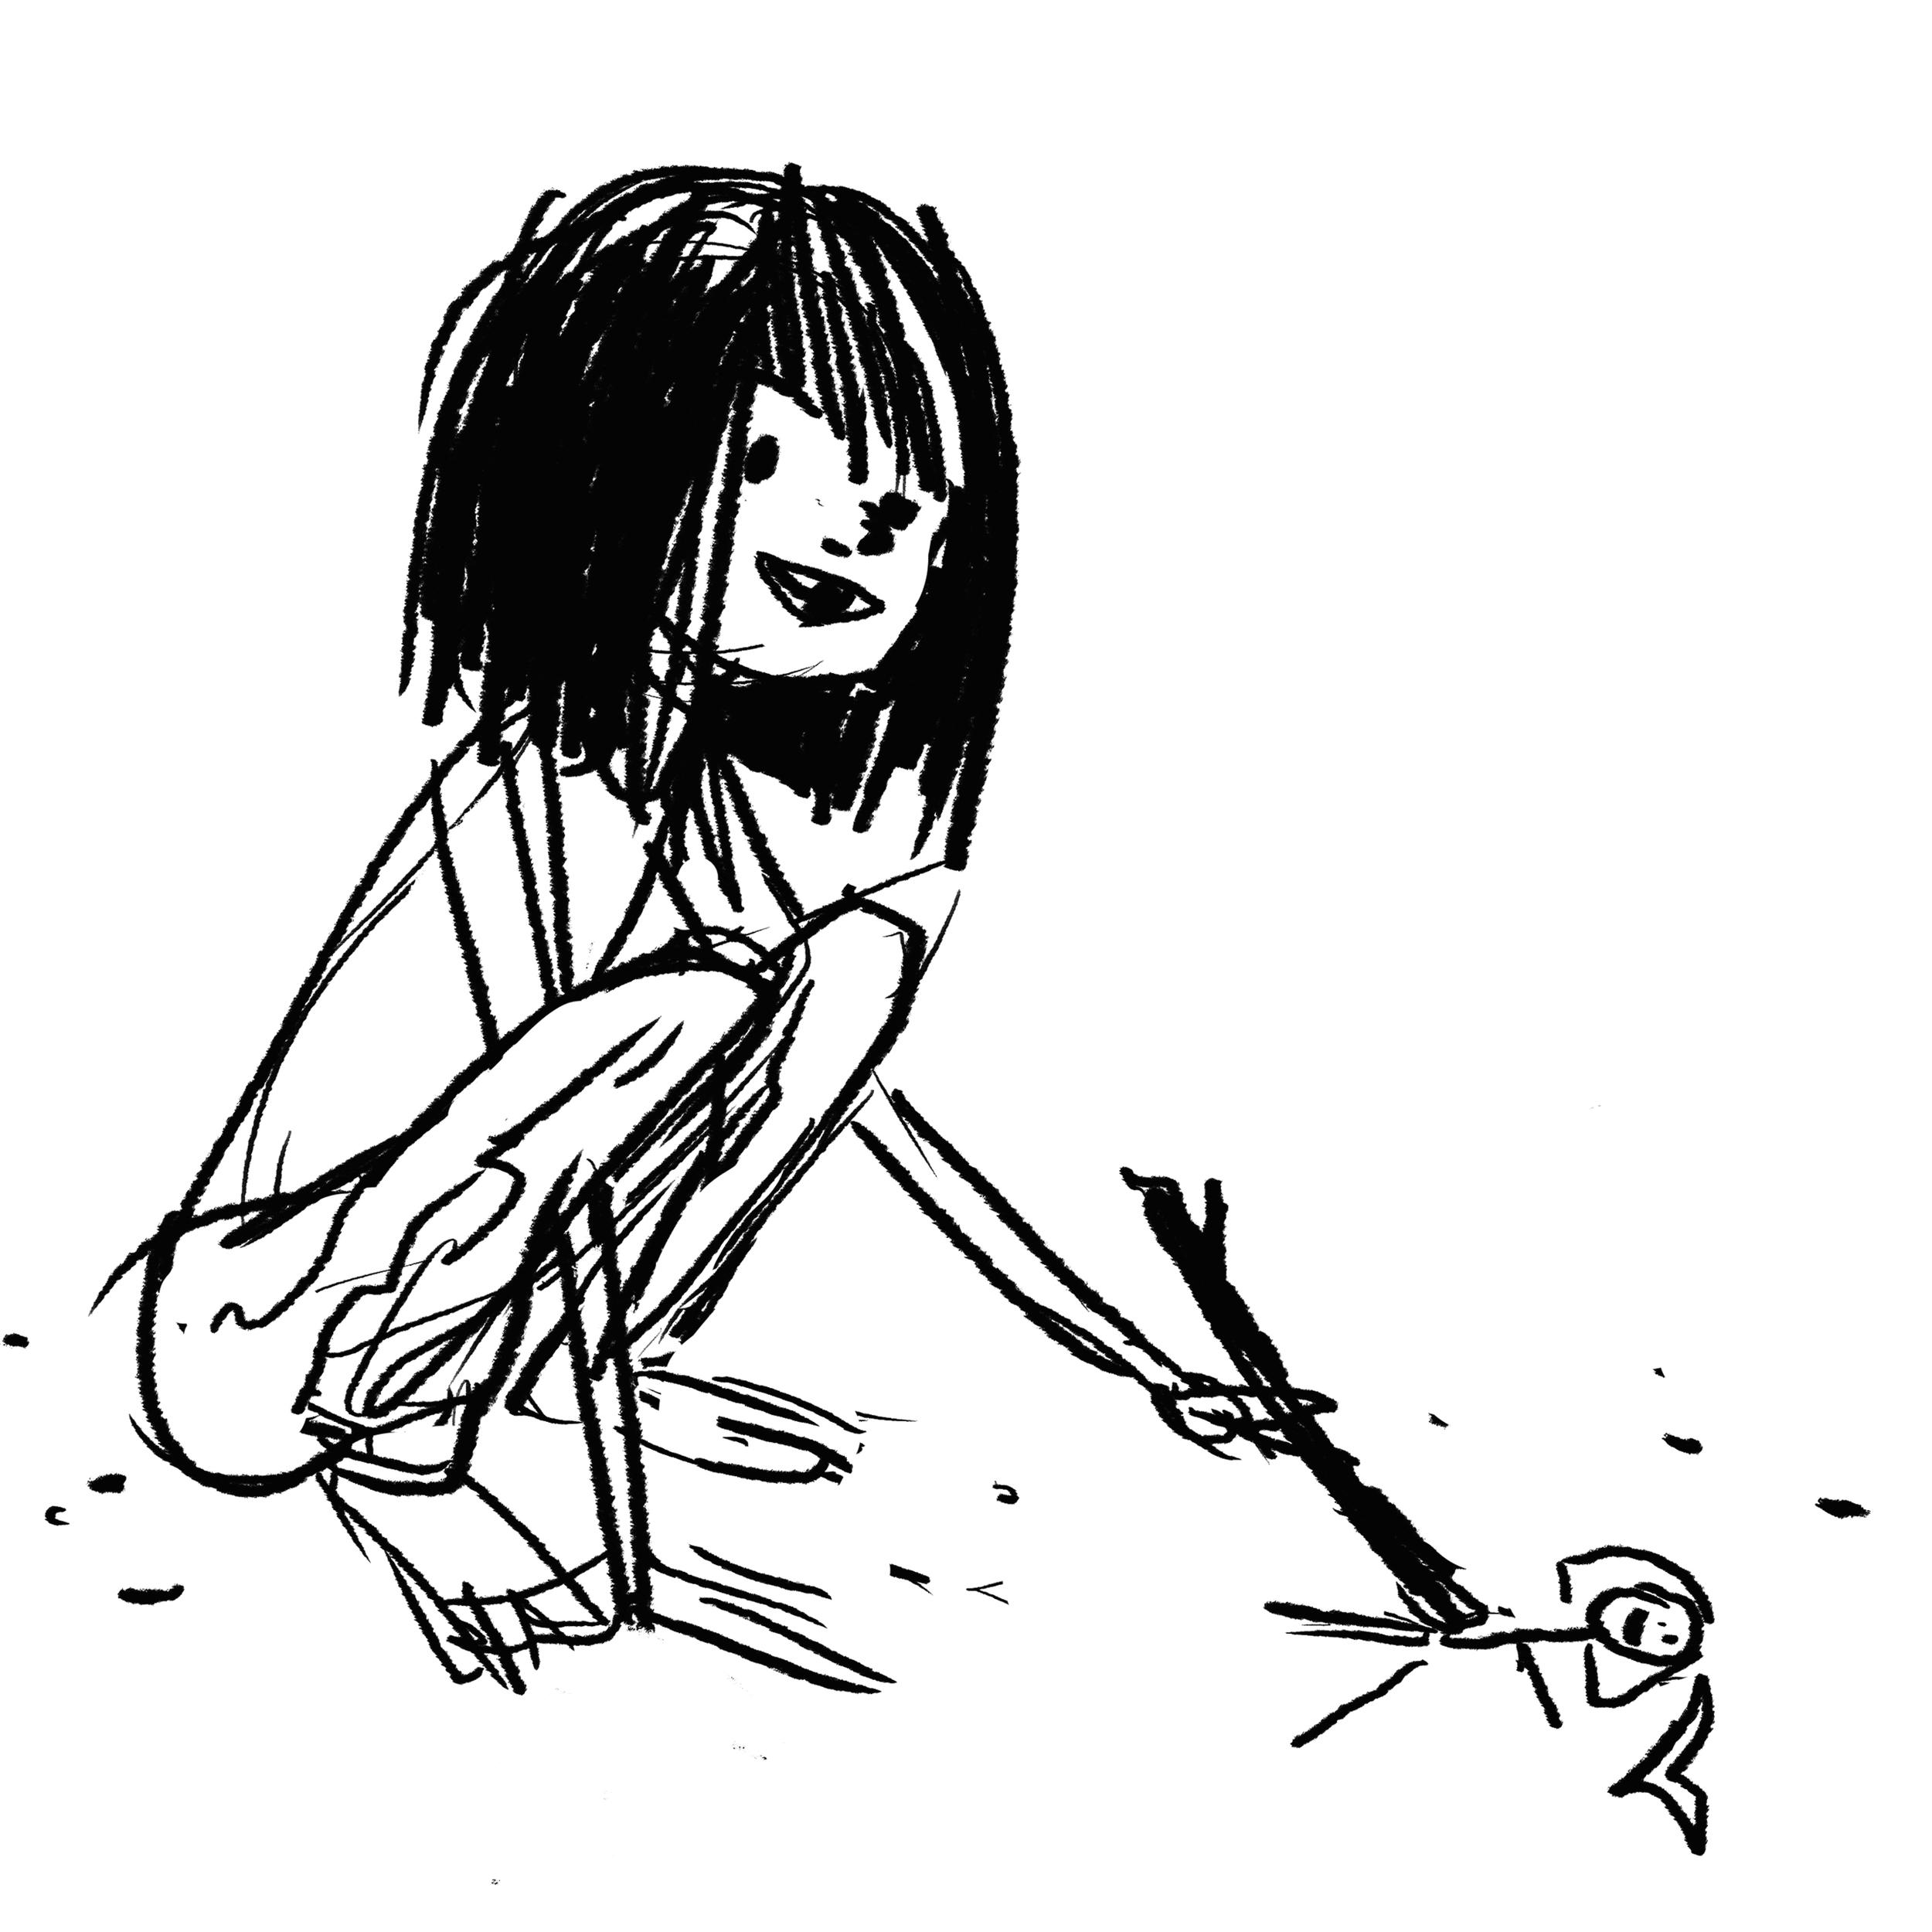 Development sketch of Lily.